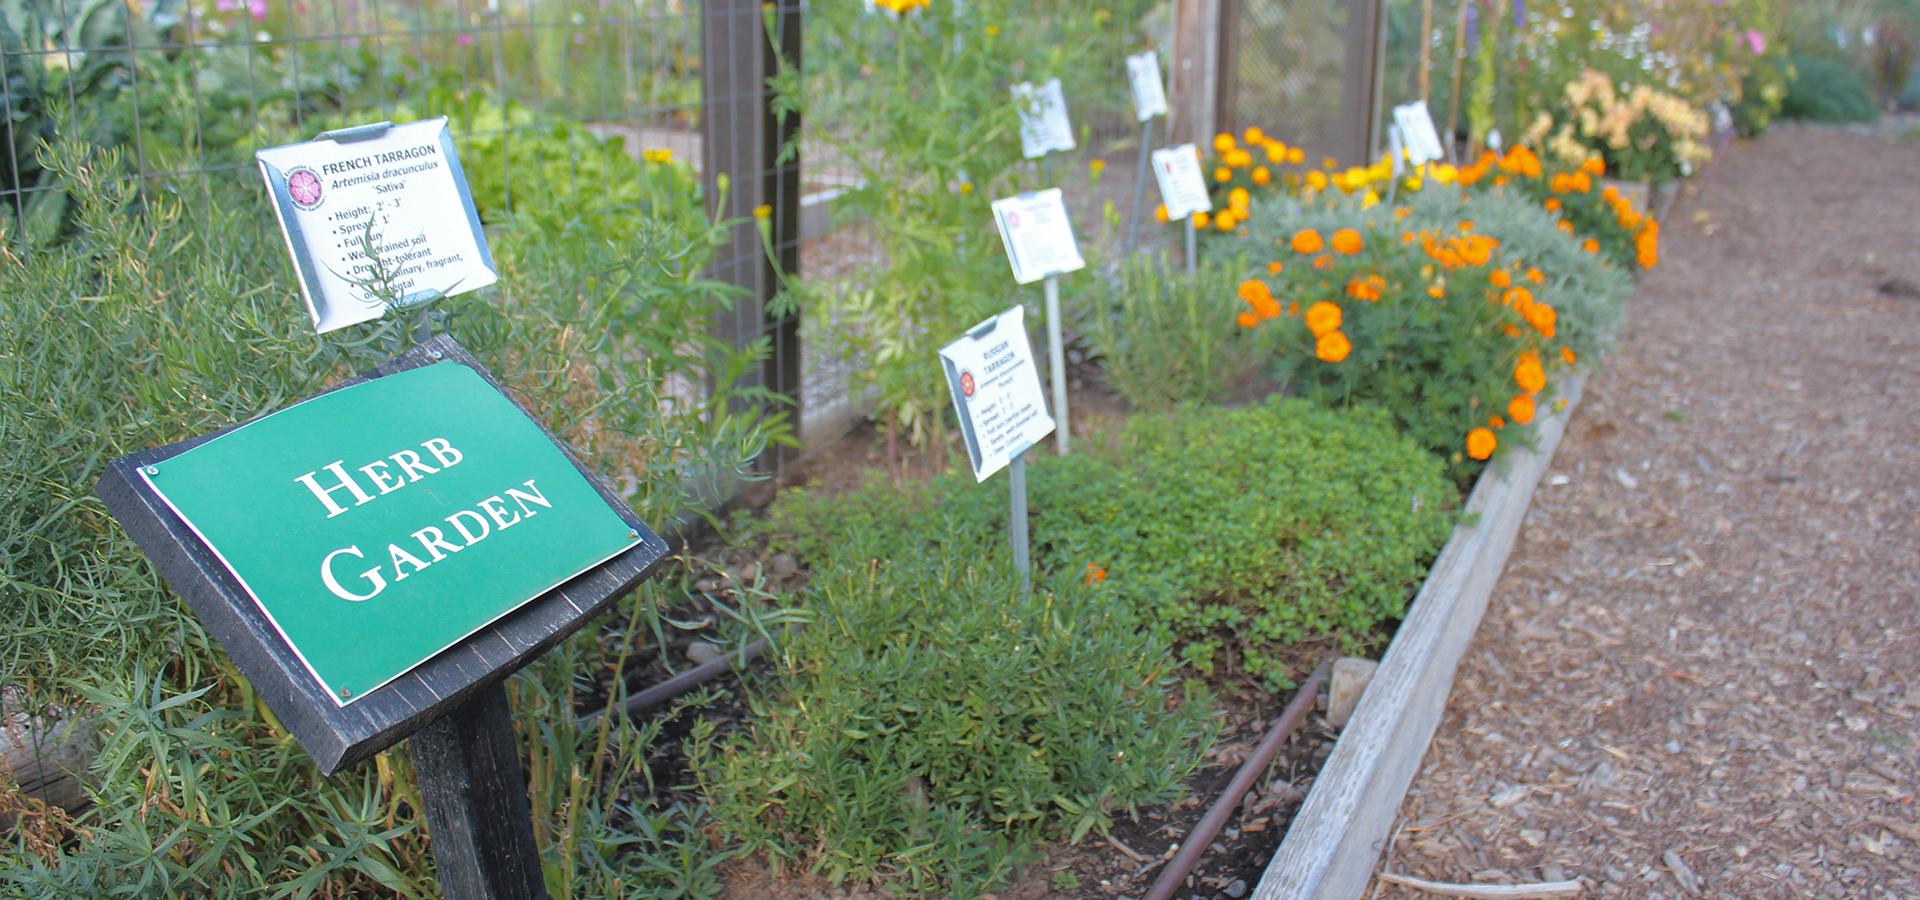 Hollinshead-Community-Garden-Herbs